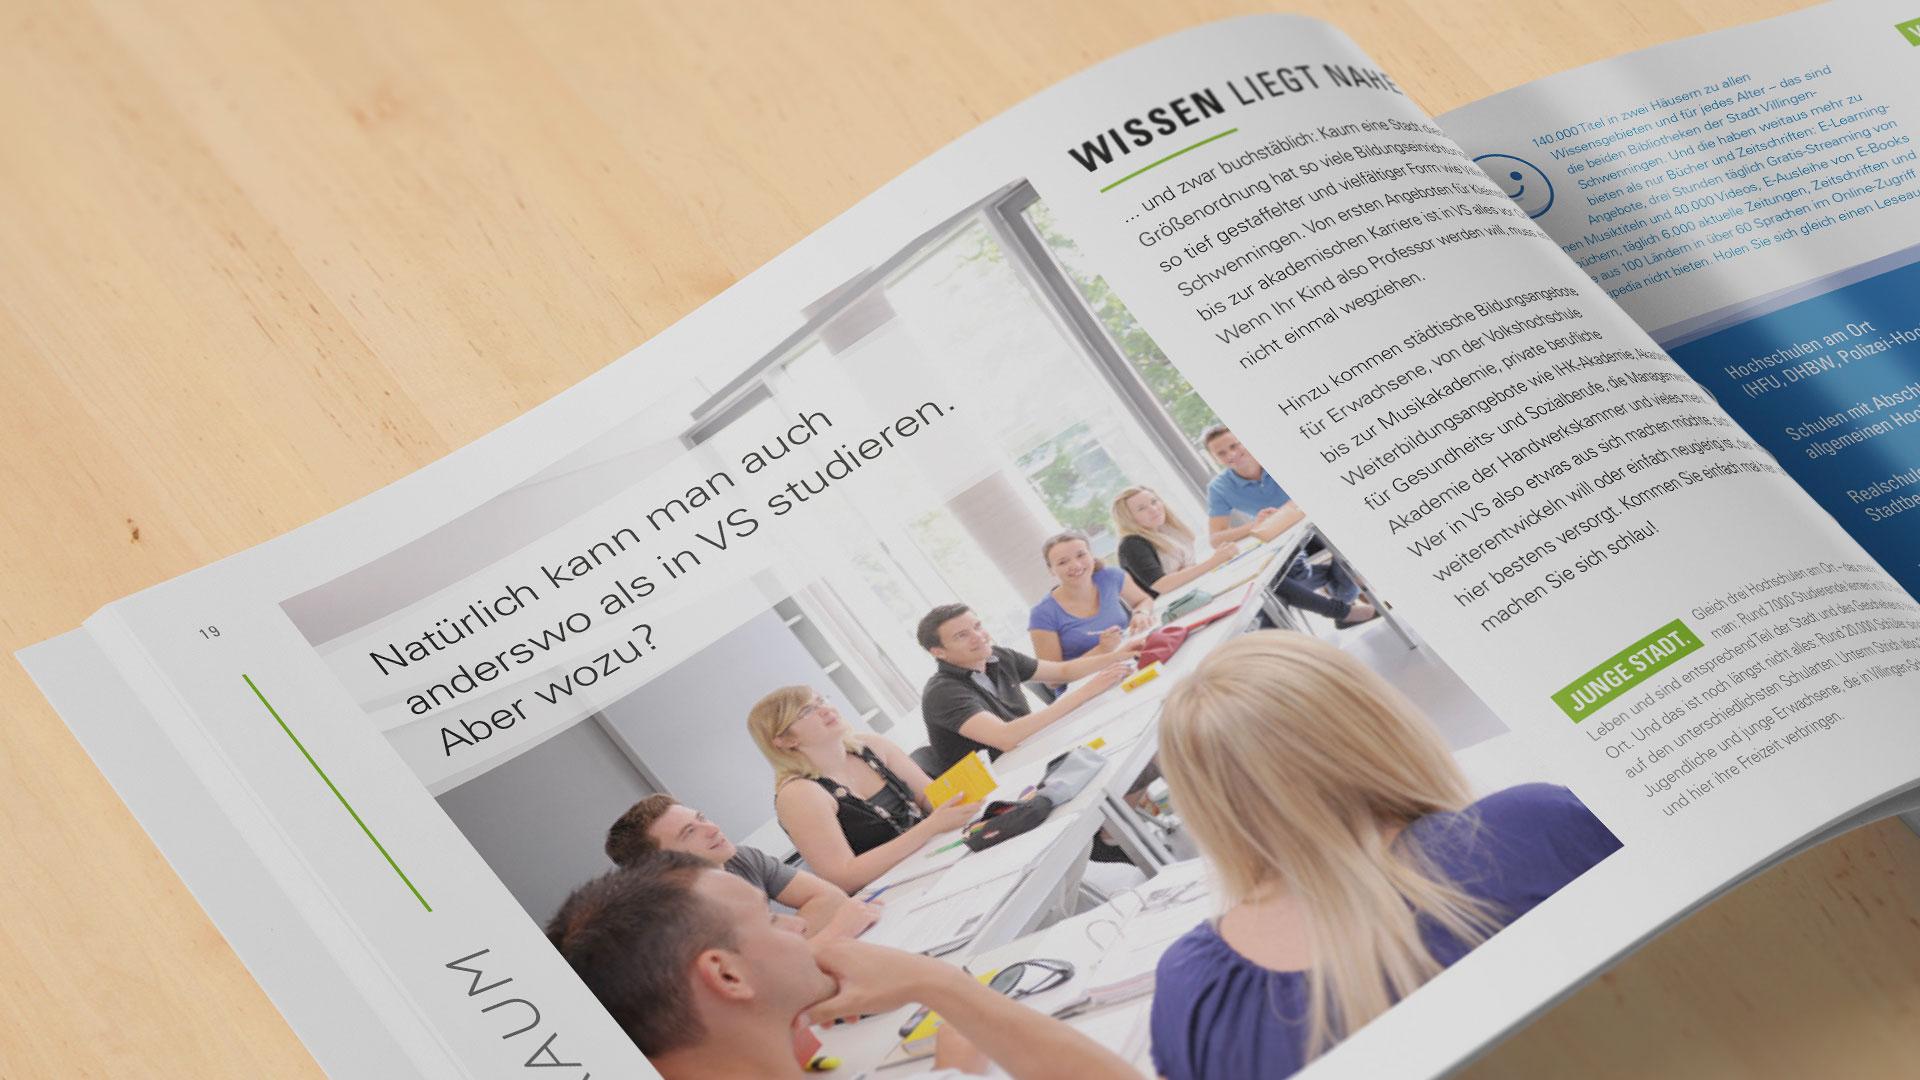 Kommune VS: Broschüre als Recruiting-Hilfe